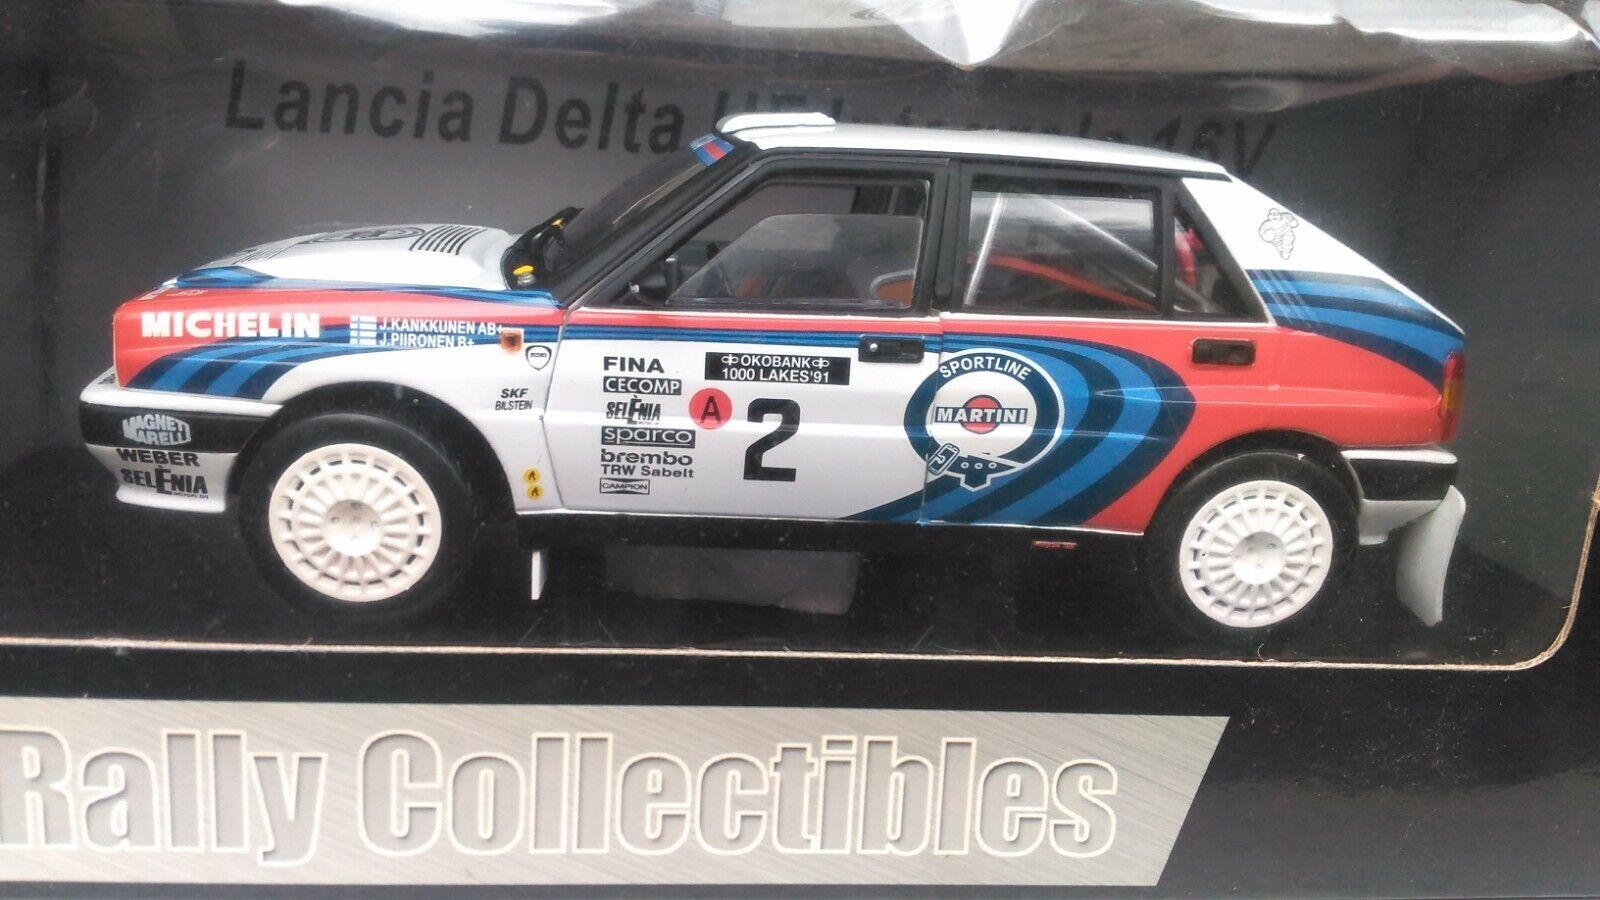 Lancia Delta HF intégrale 16 V 1991 Sunstar 1 18 1991 - Rallye des 1000 lacs